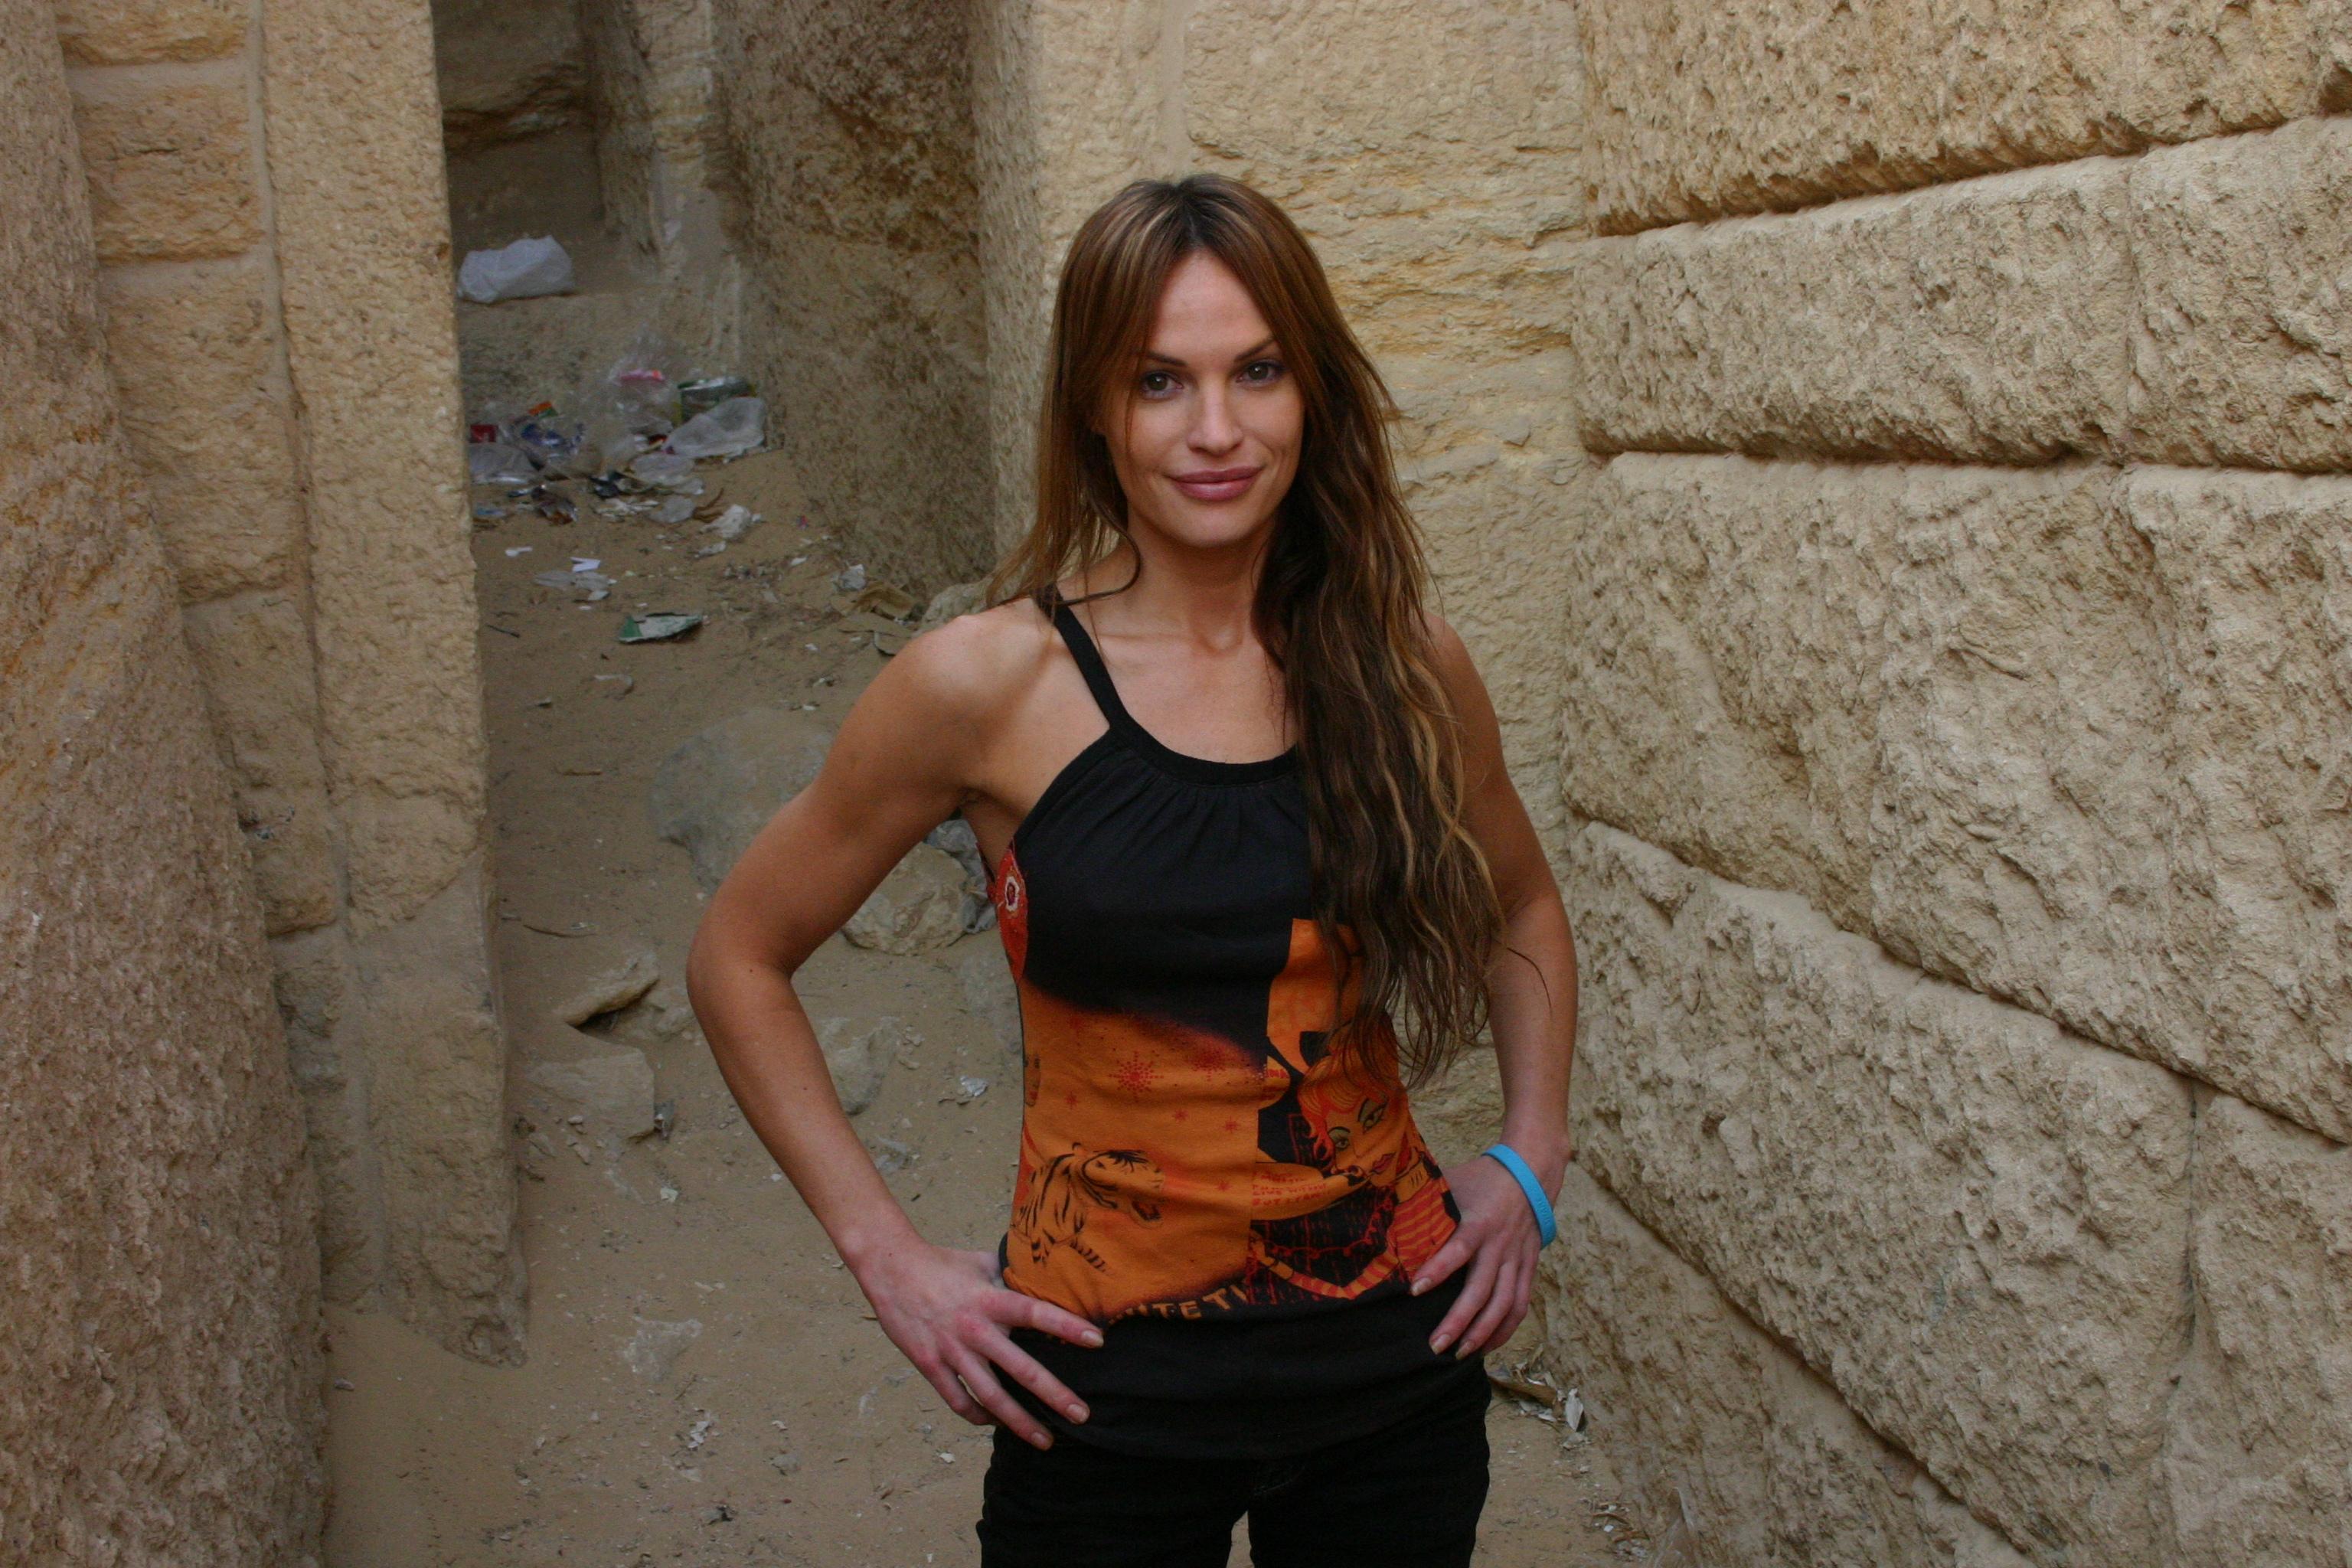 Donna Vivino,Olivia Taylor Dudley Erotic pics & movies Joanne Froggatt (born 1980),Tom Holland (born 1996)